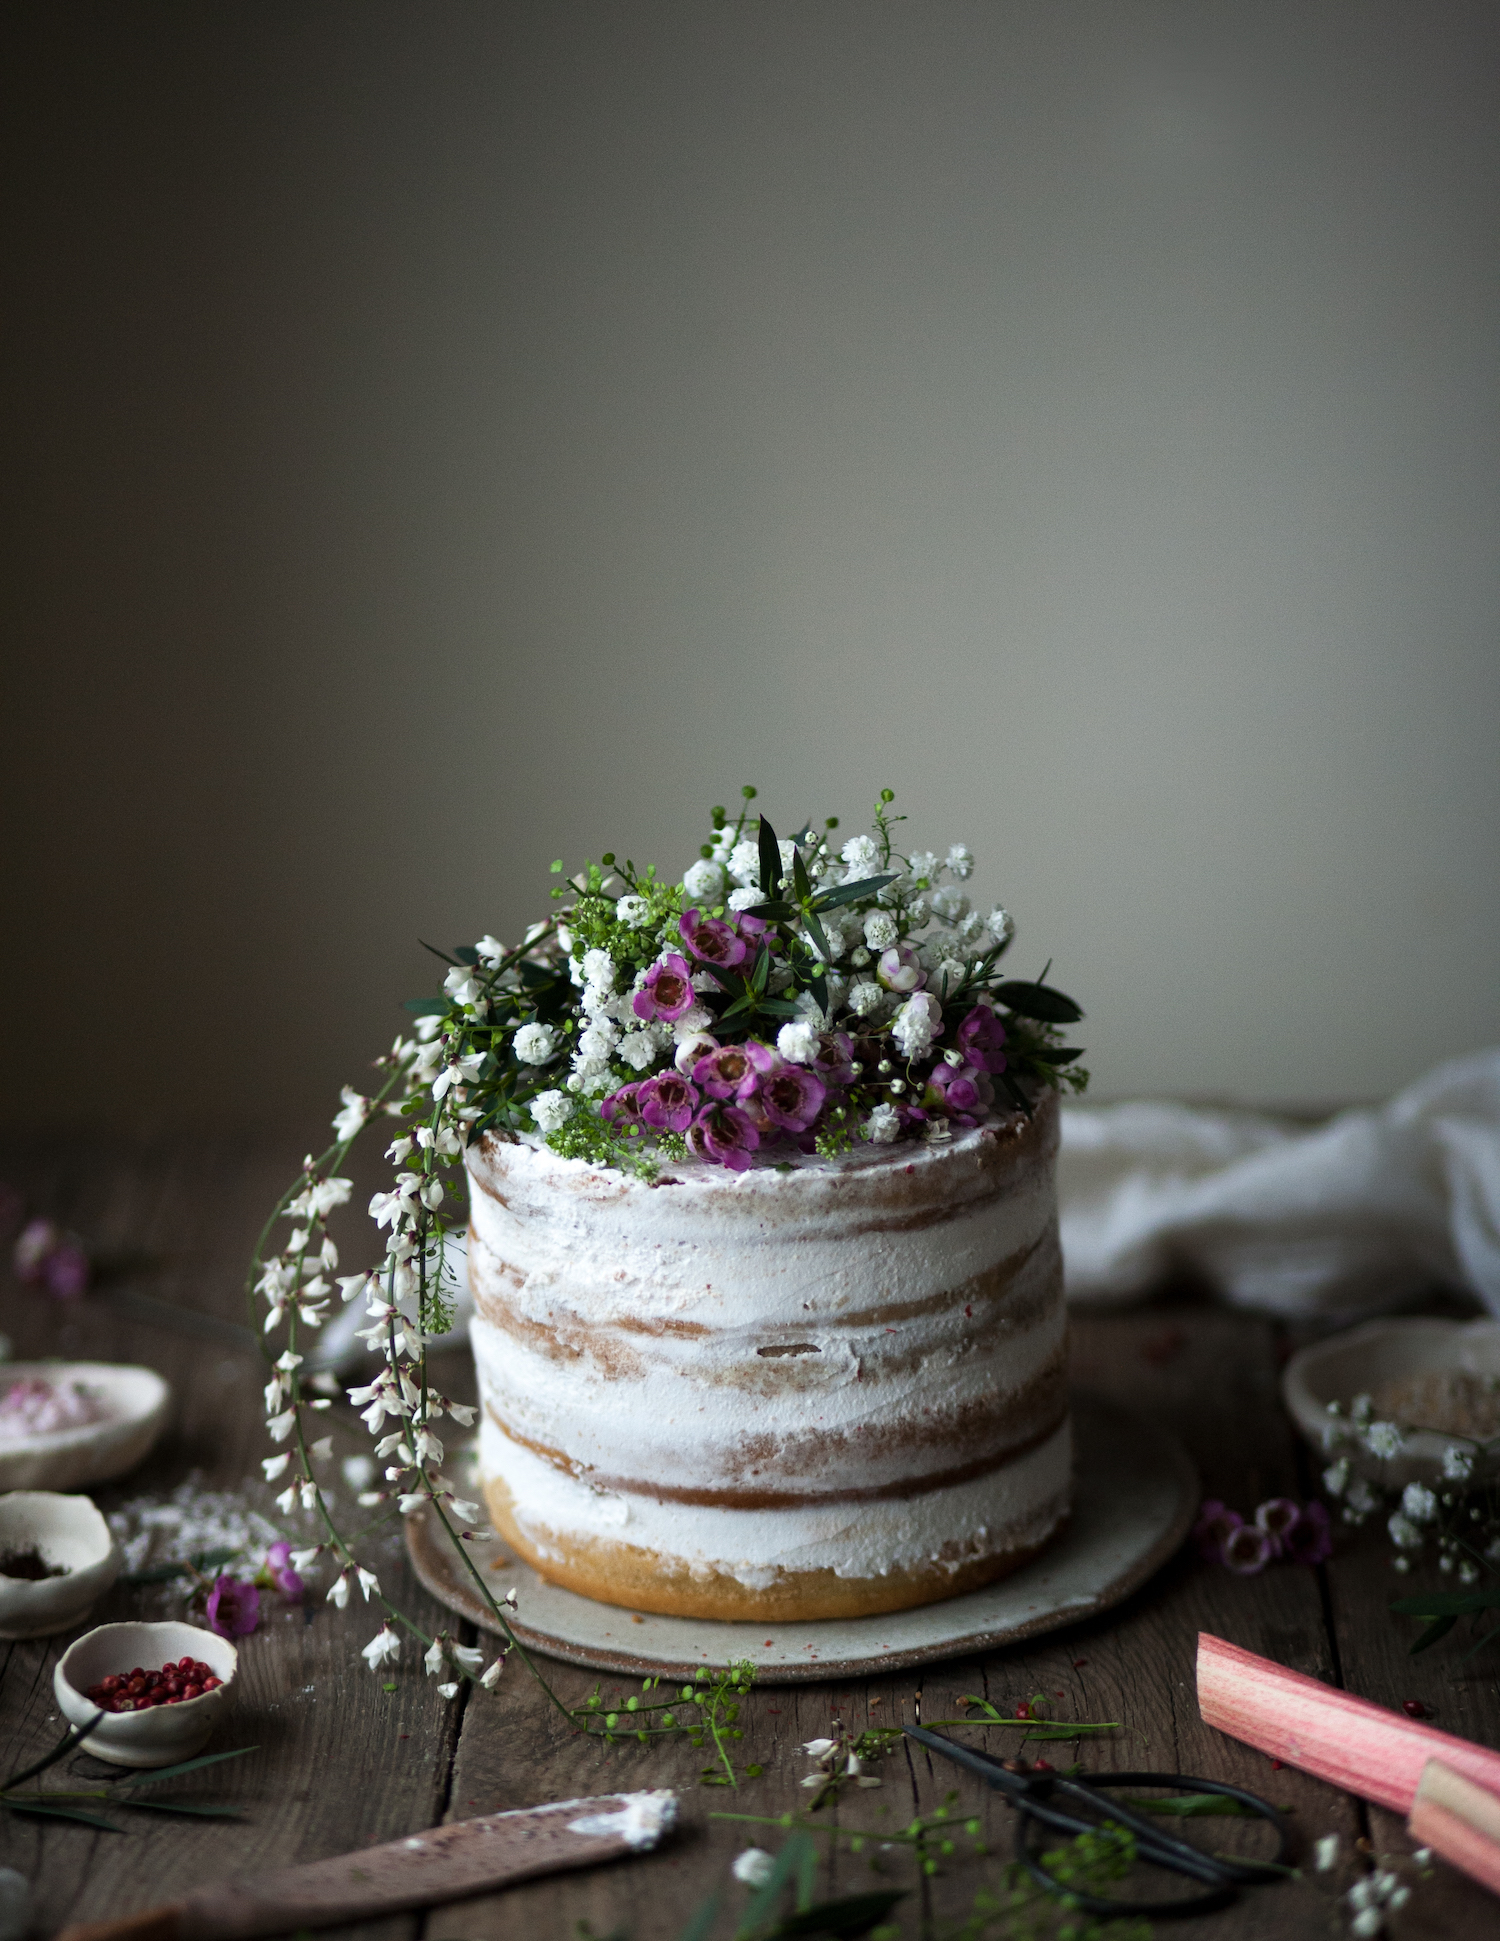 Peachy 2 Birthday Cake 10 Years Irmasworld Jasmin Khezri Irma Funny Birthday Cards Online Aboleapandamsfinfo